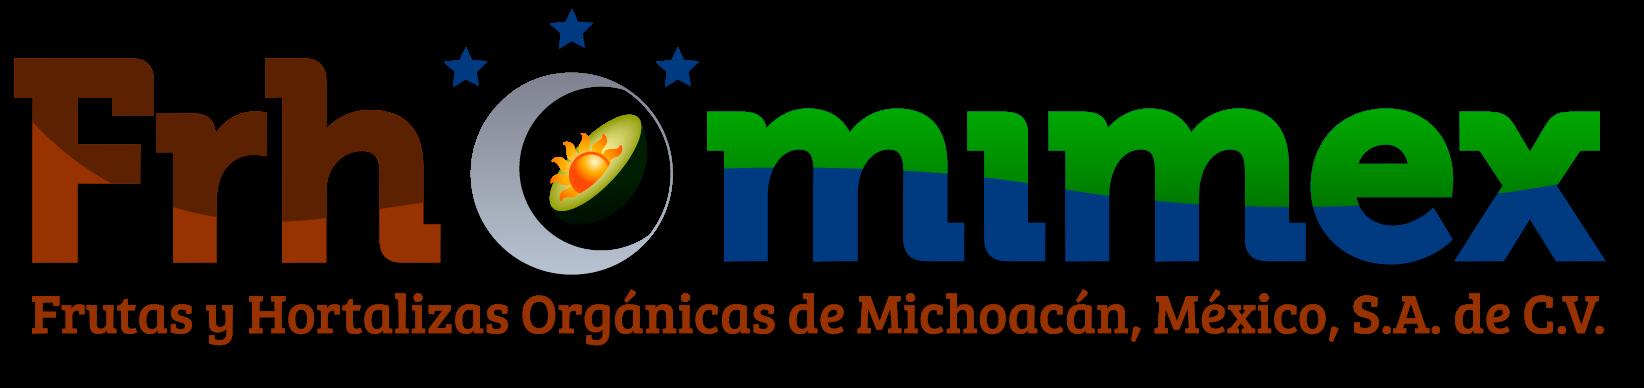 Logotipo Frhomimex